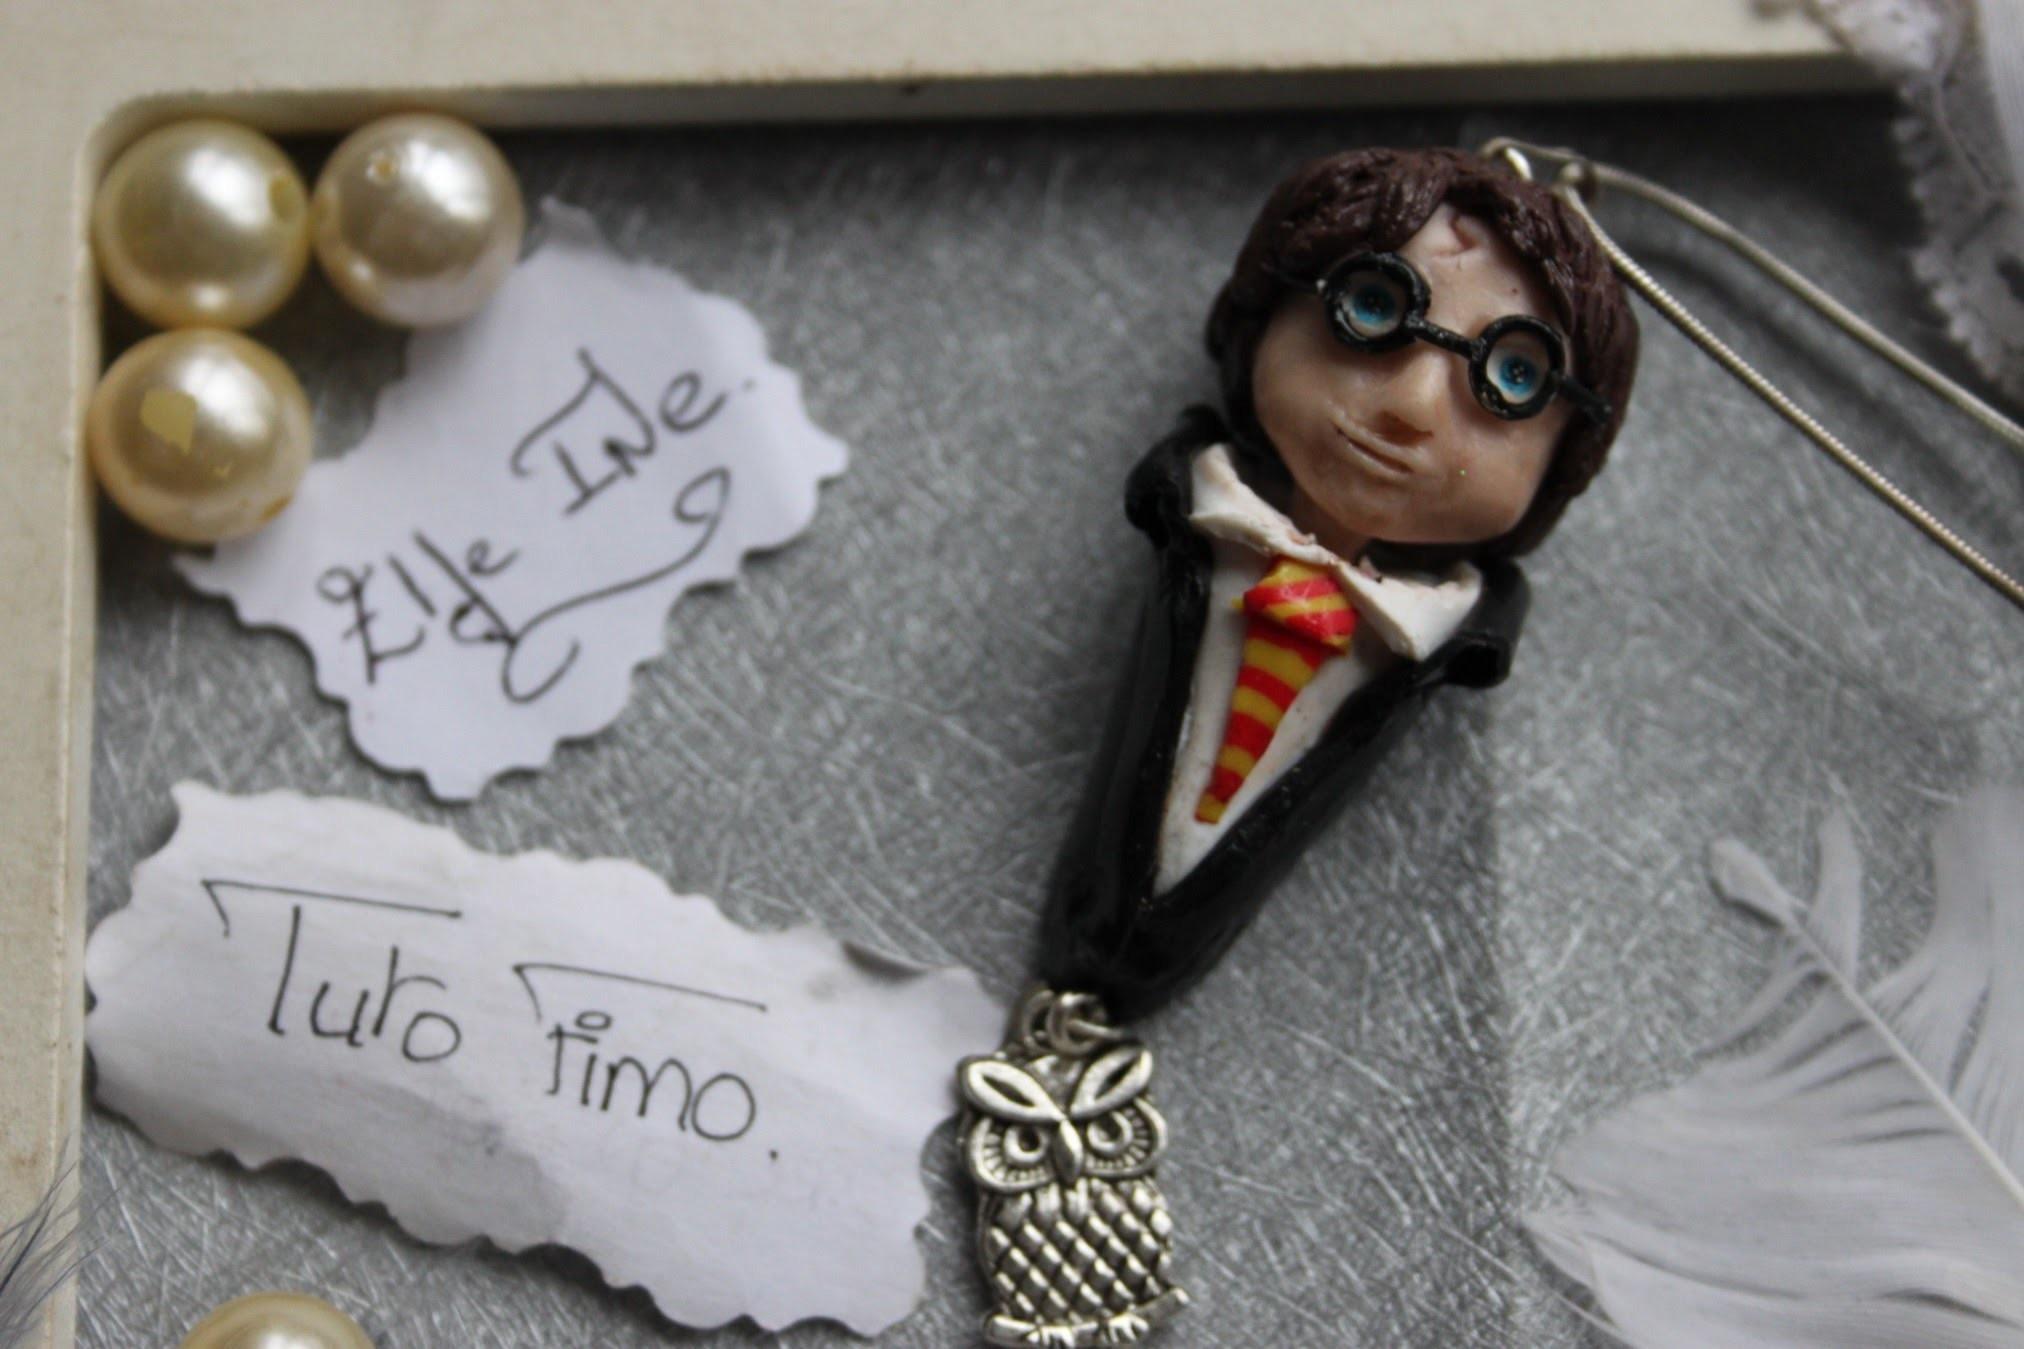 [♥✿ Tuto Fimo.Polymer Clay Tutorial : Harry Potter ✿♥]